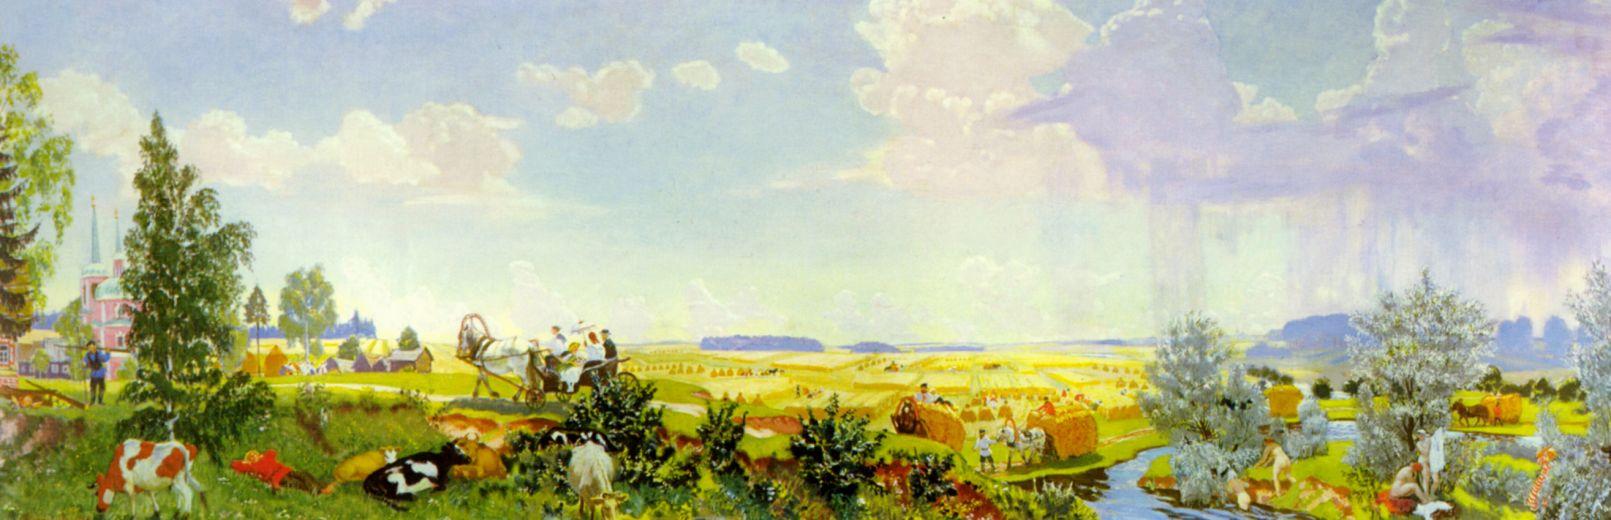 Борис Михайлович Кустодиев. Лето